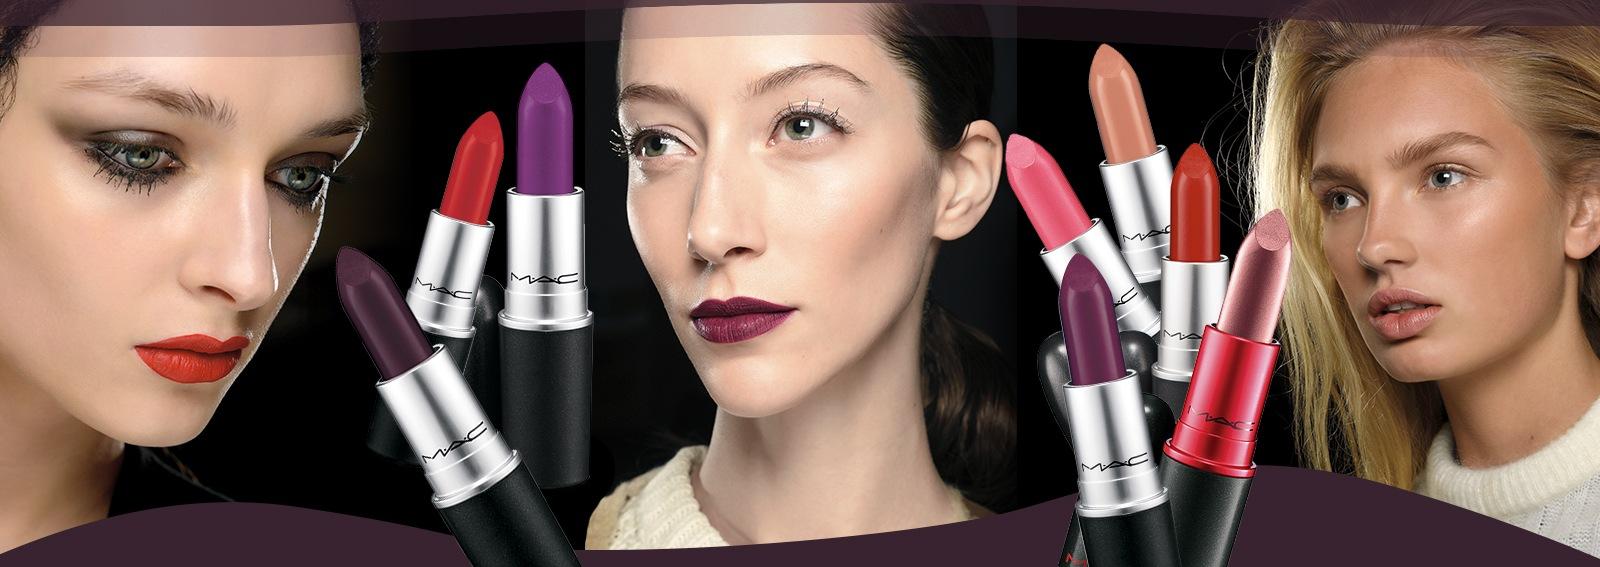 cover-i-10-rossetti-mac-cosmetics-desktop